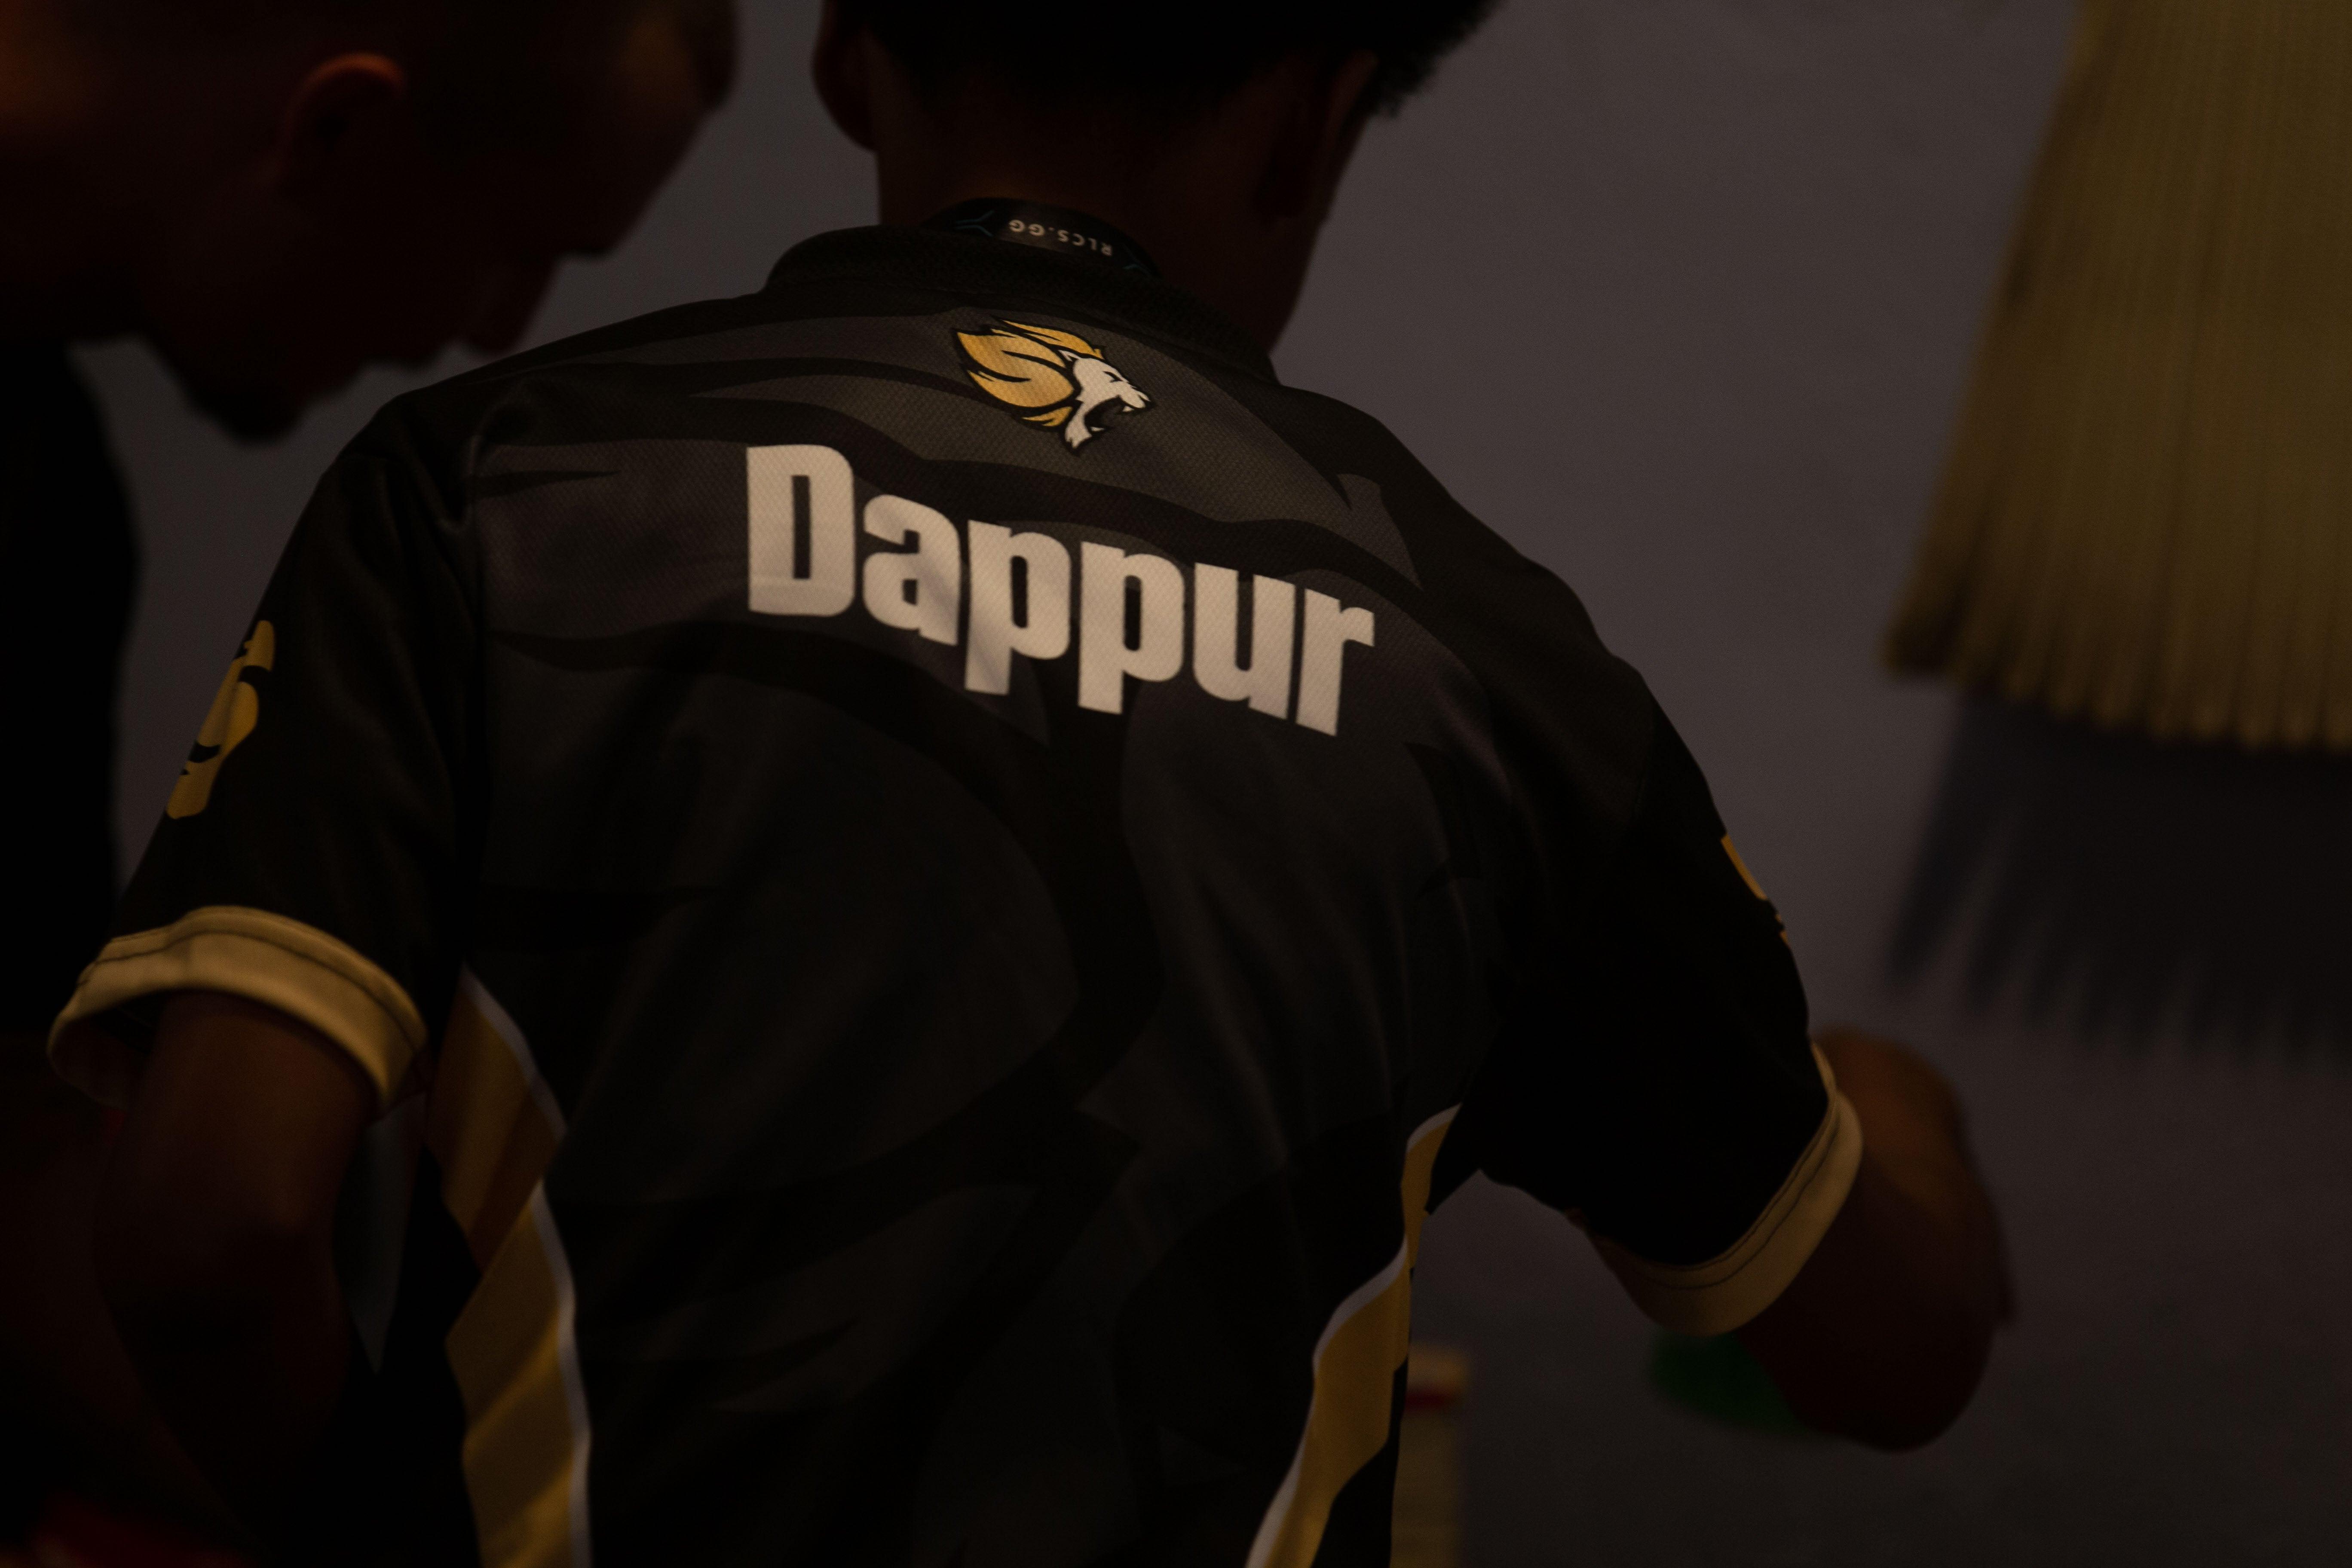 Dappur 2 Community Spotlight